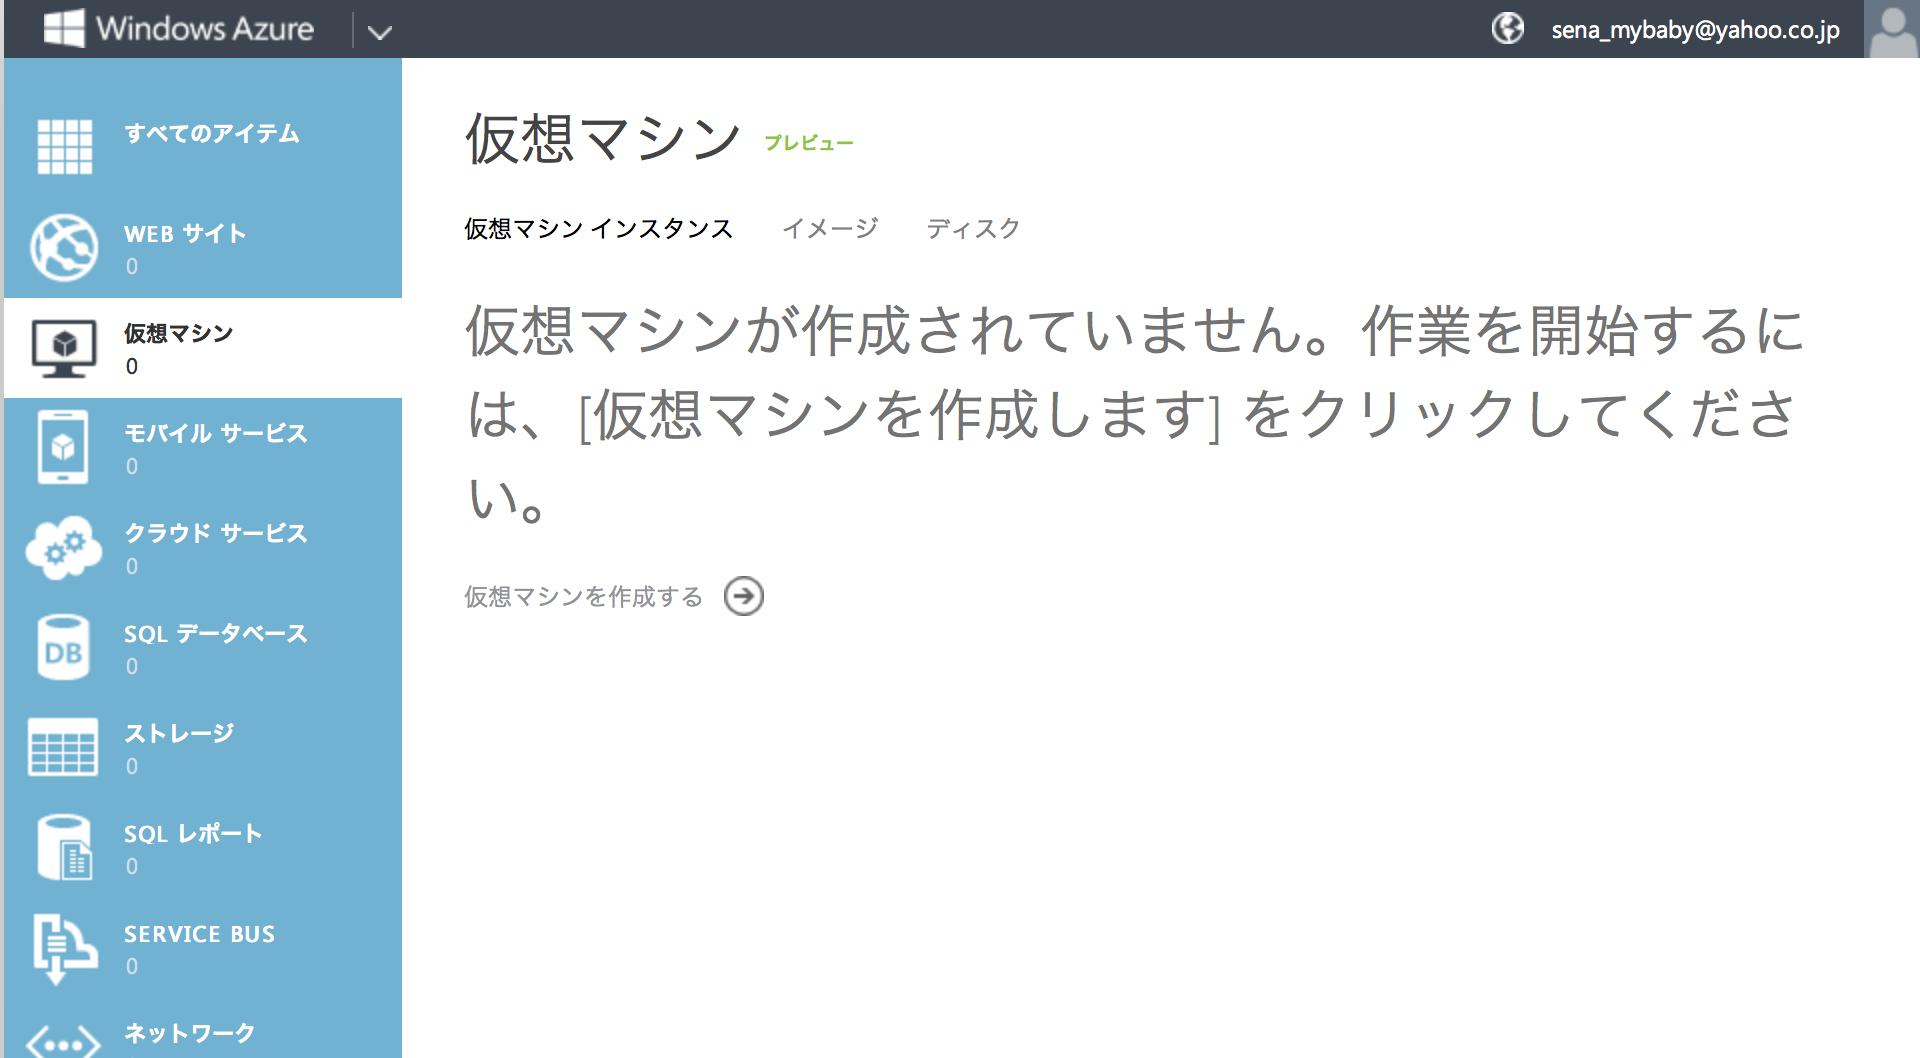 Windows Azureの管理画面